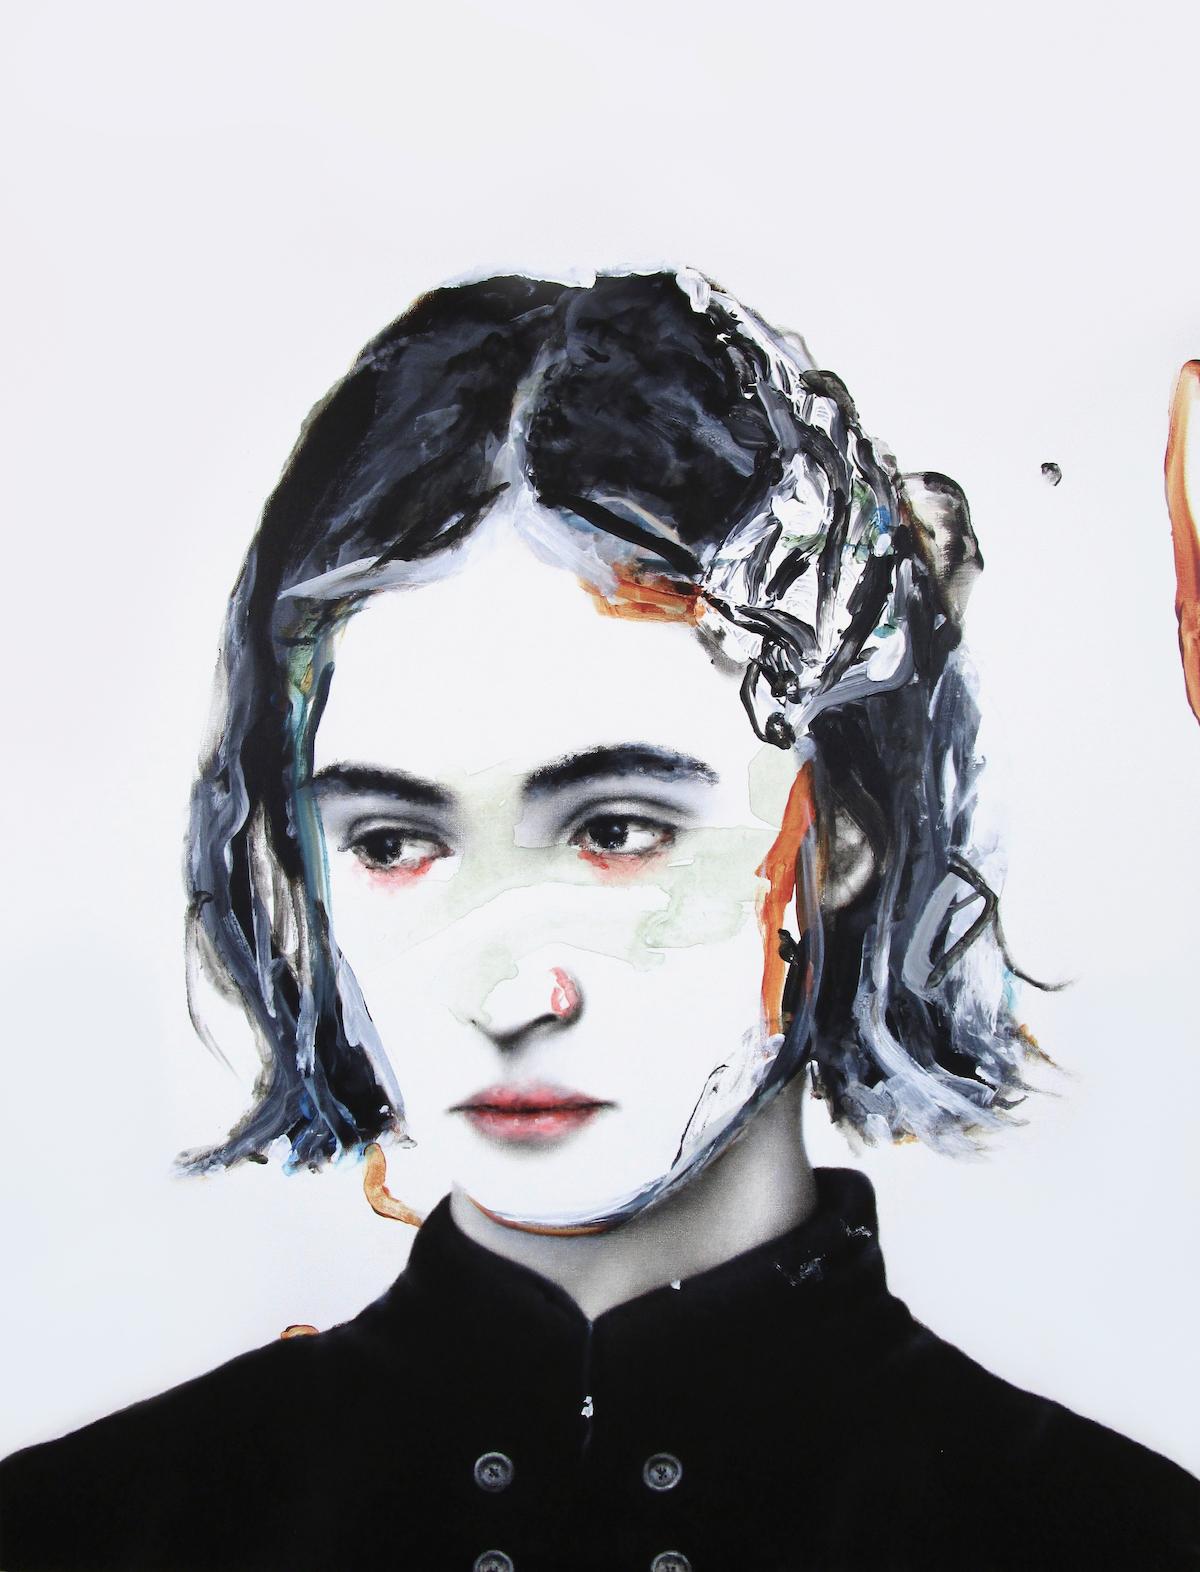 antoine cordet canvas toile peinture painting portrait art artist artiste peintre acrylic oil thanks for the scars